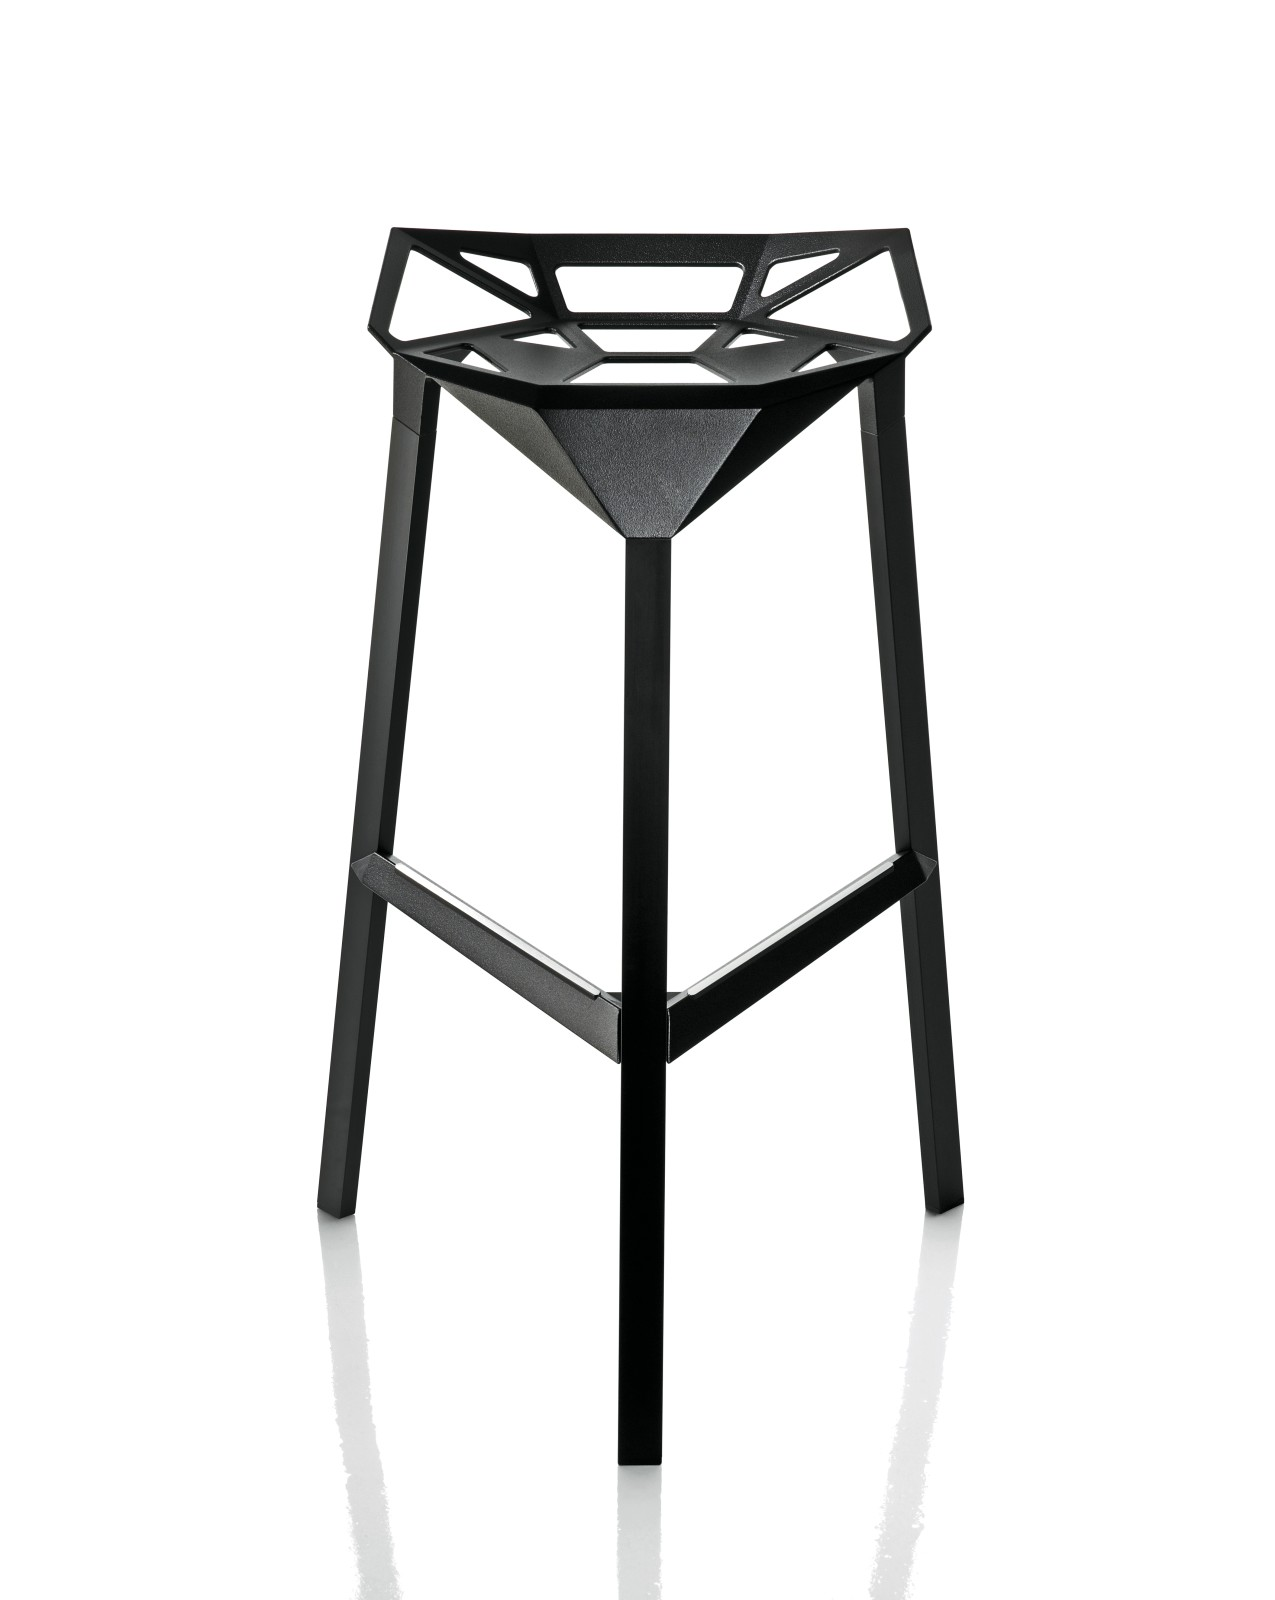 Stool One High Stool - Set of 2 Black, 74cm